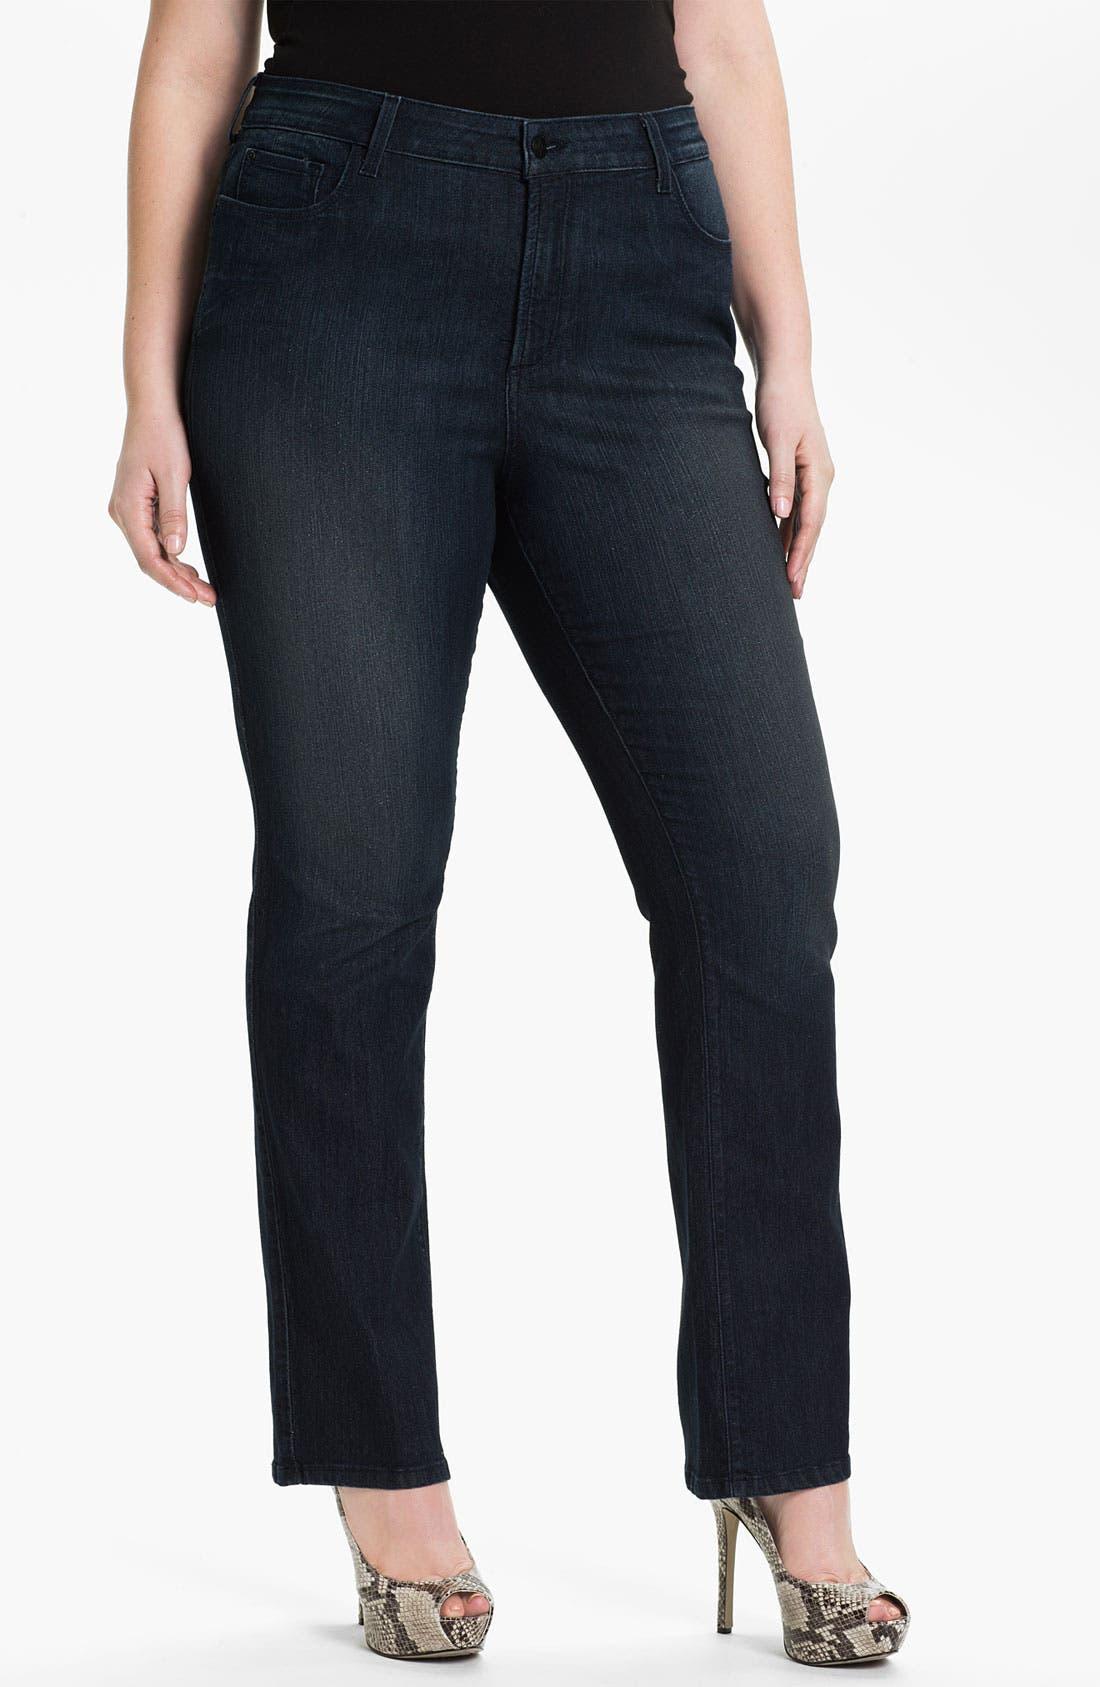 Alternate Image 1 Selected - NYDJ 'Marilyn' Straight Leg Stretch Denim Jeans (Plus)